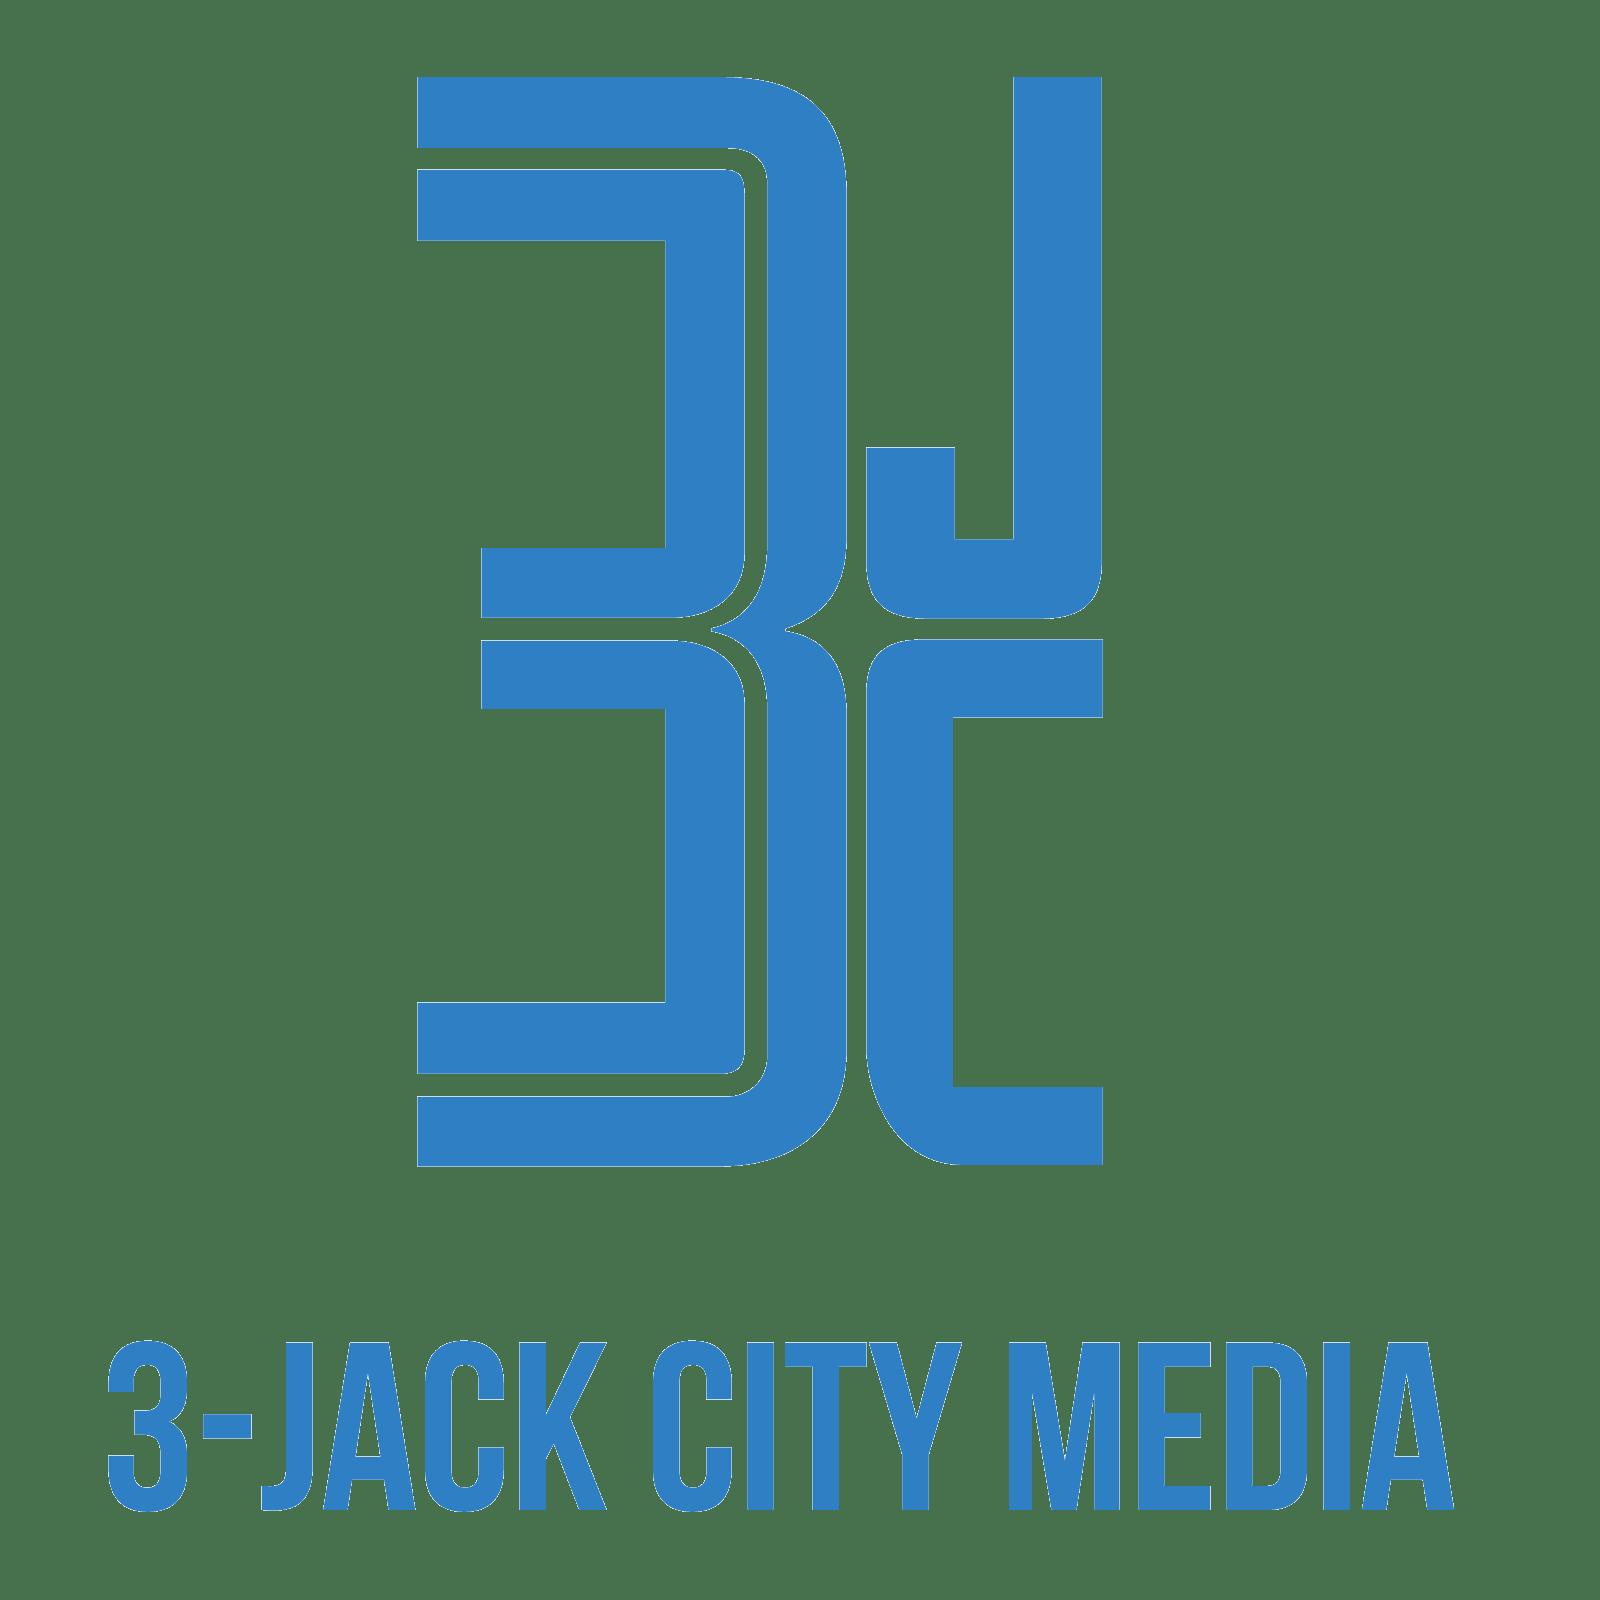 3-Jack City Media logo